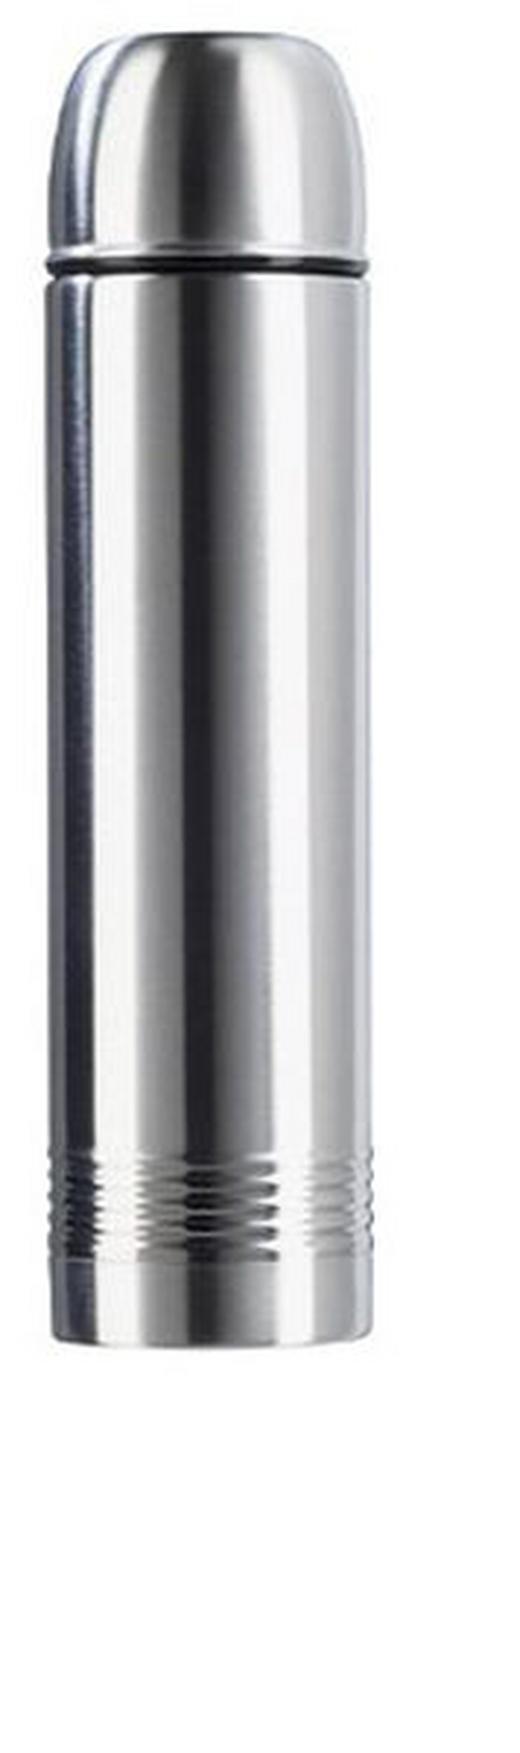 ISOLIERFLASCHE 0,7 L - Edelstahlfarben, Basics, Metall (0,7l) - Emsa